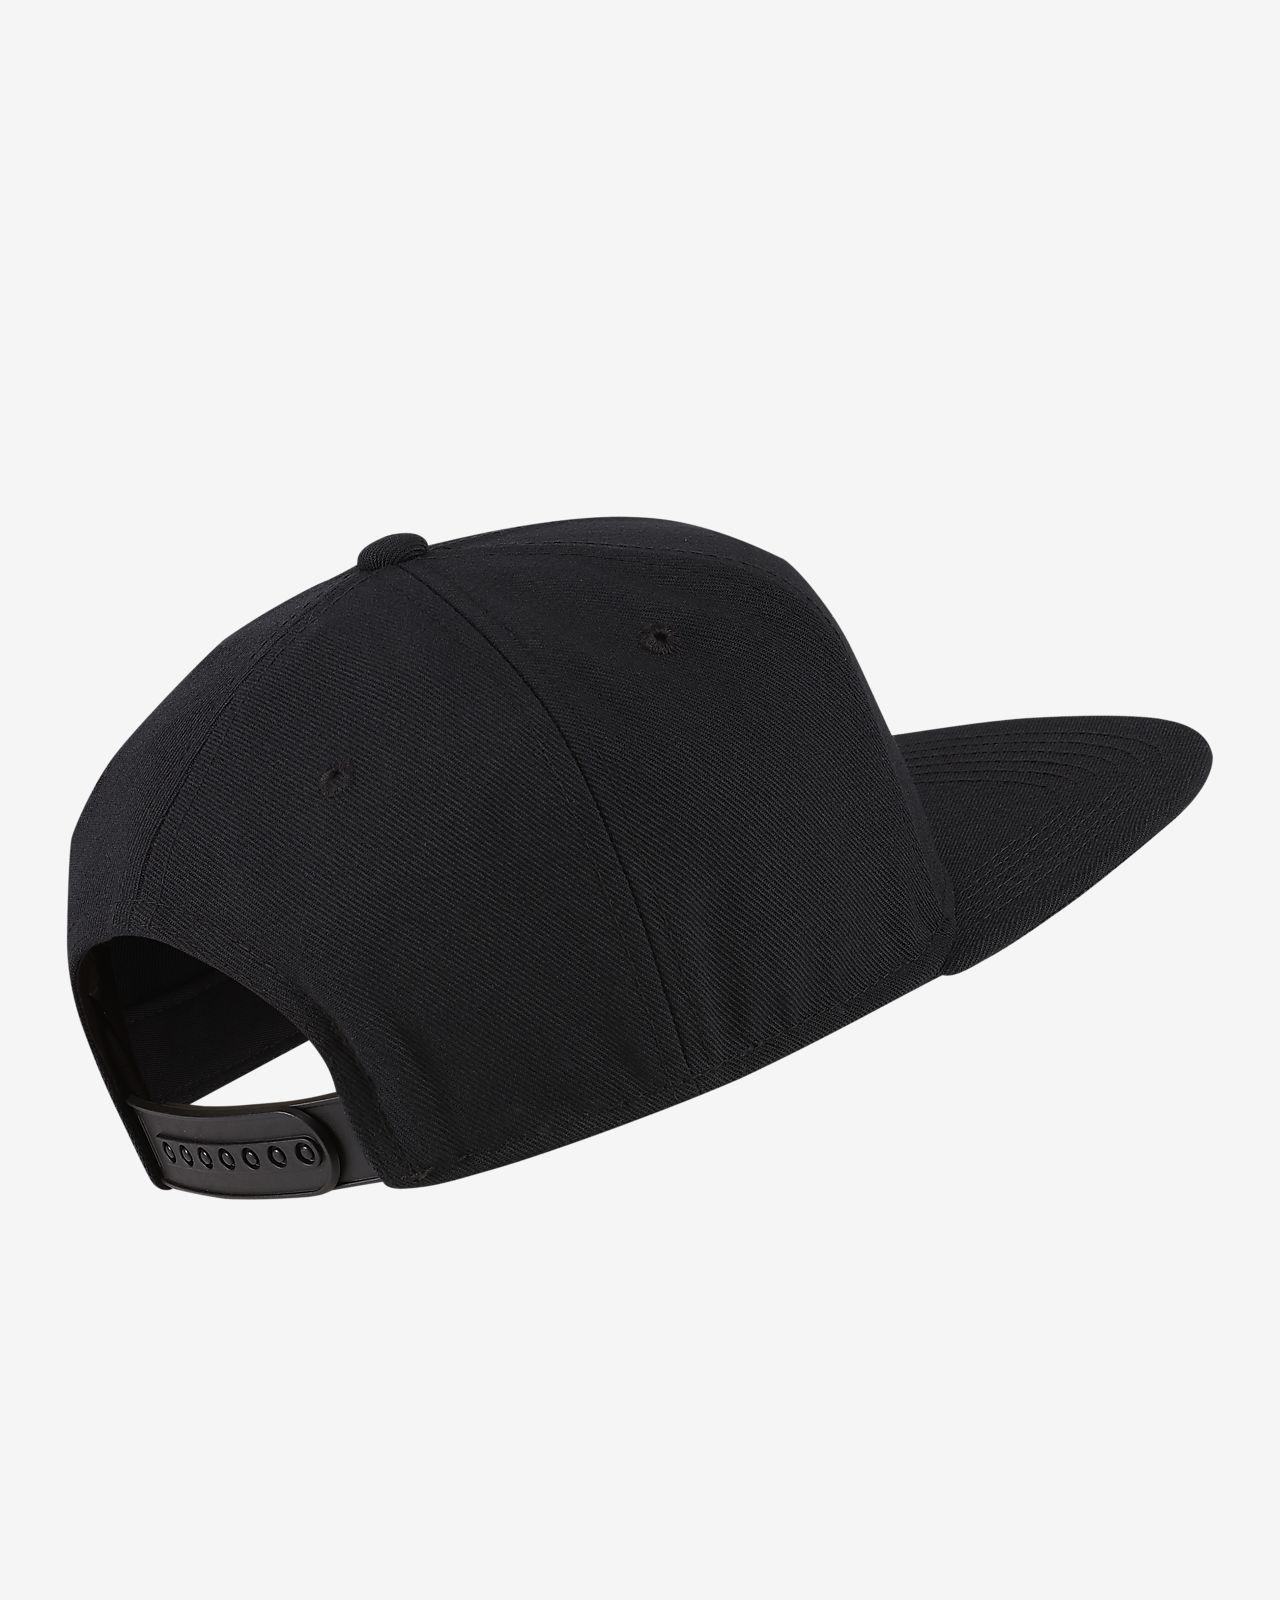 2346303e0 Nike Pro Paris Saint-Germain Older Kids' Adjustable Hat